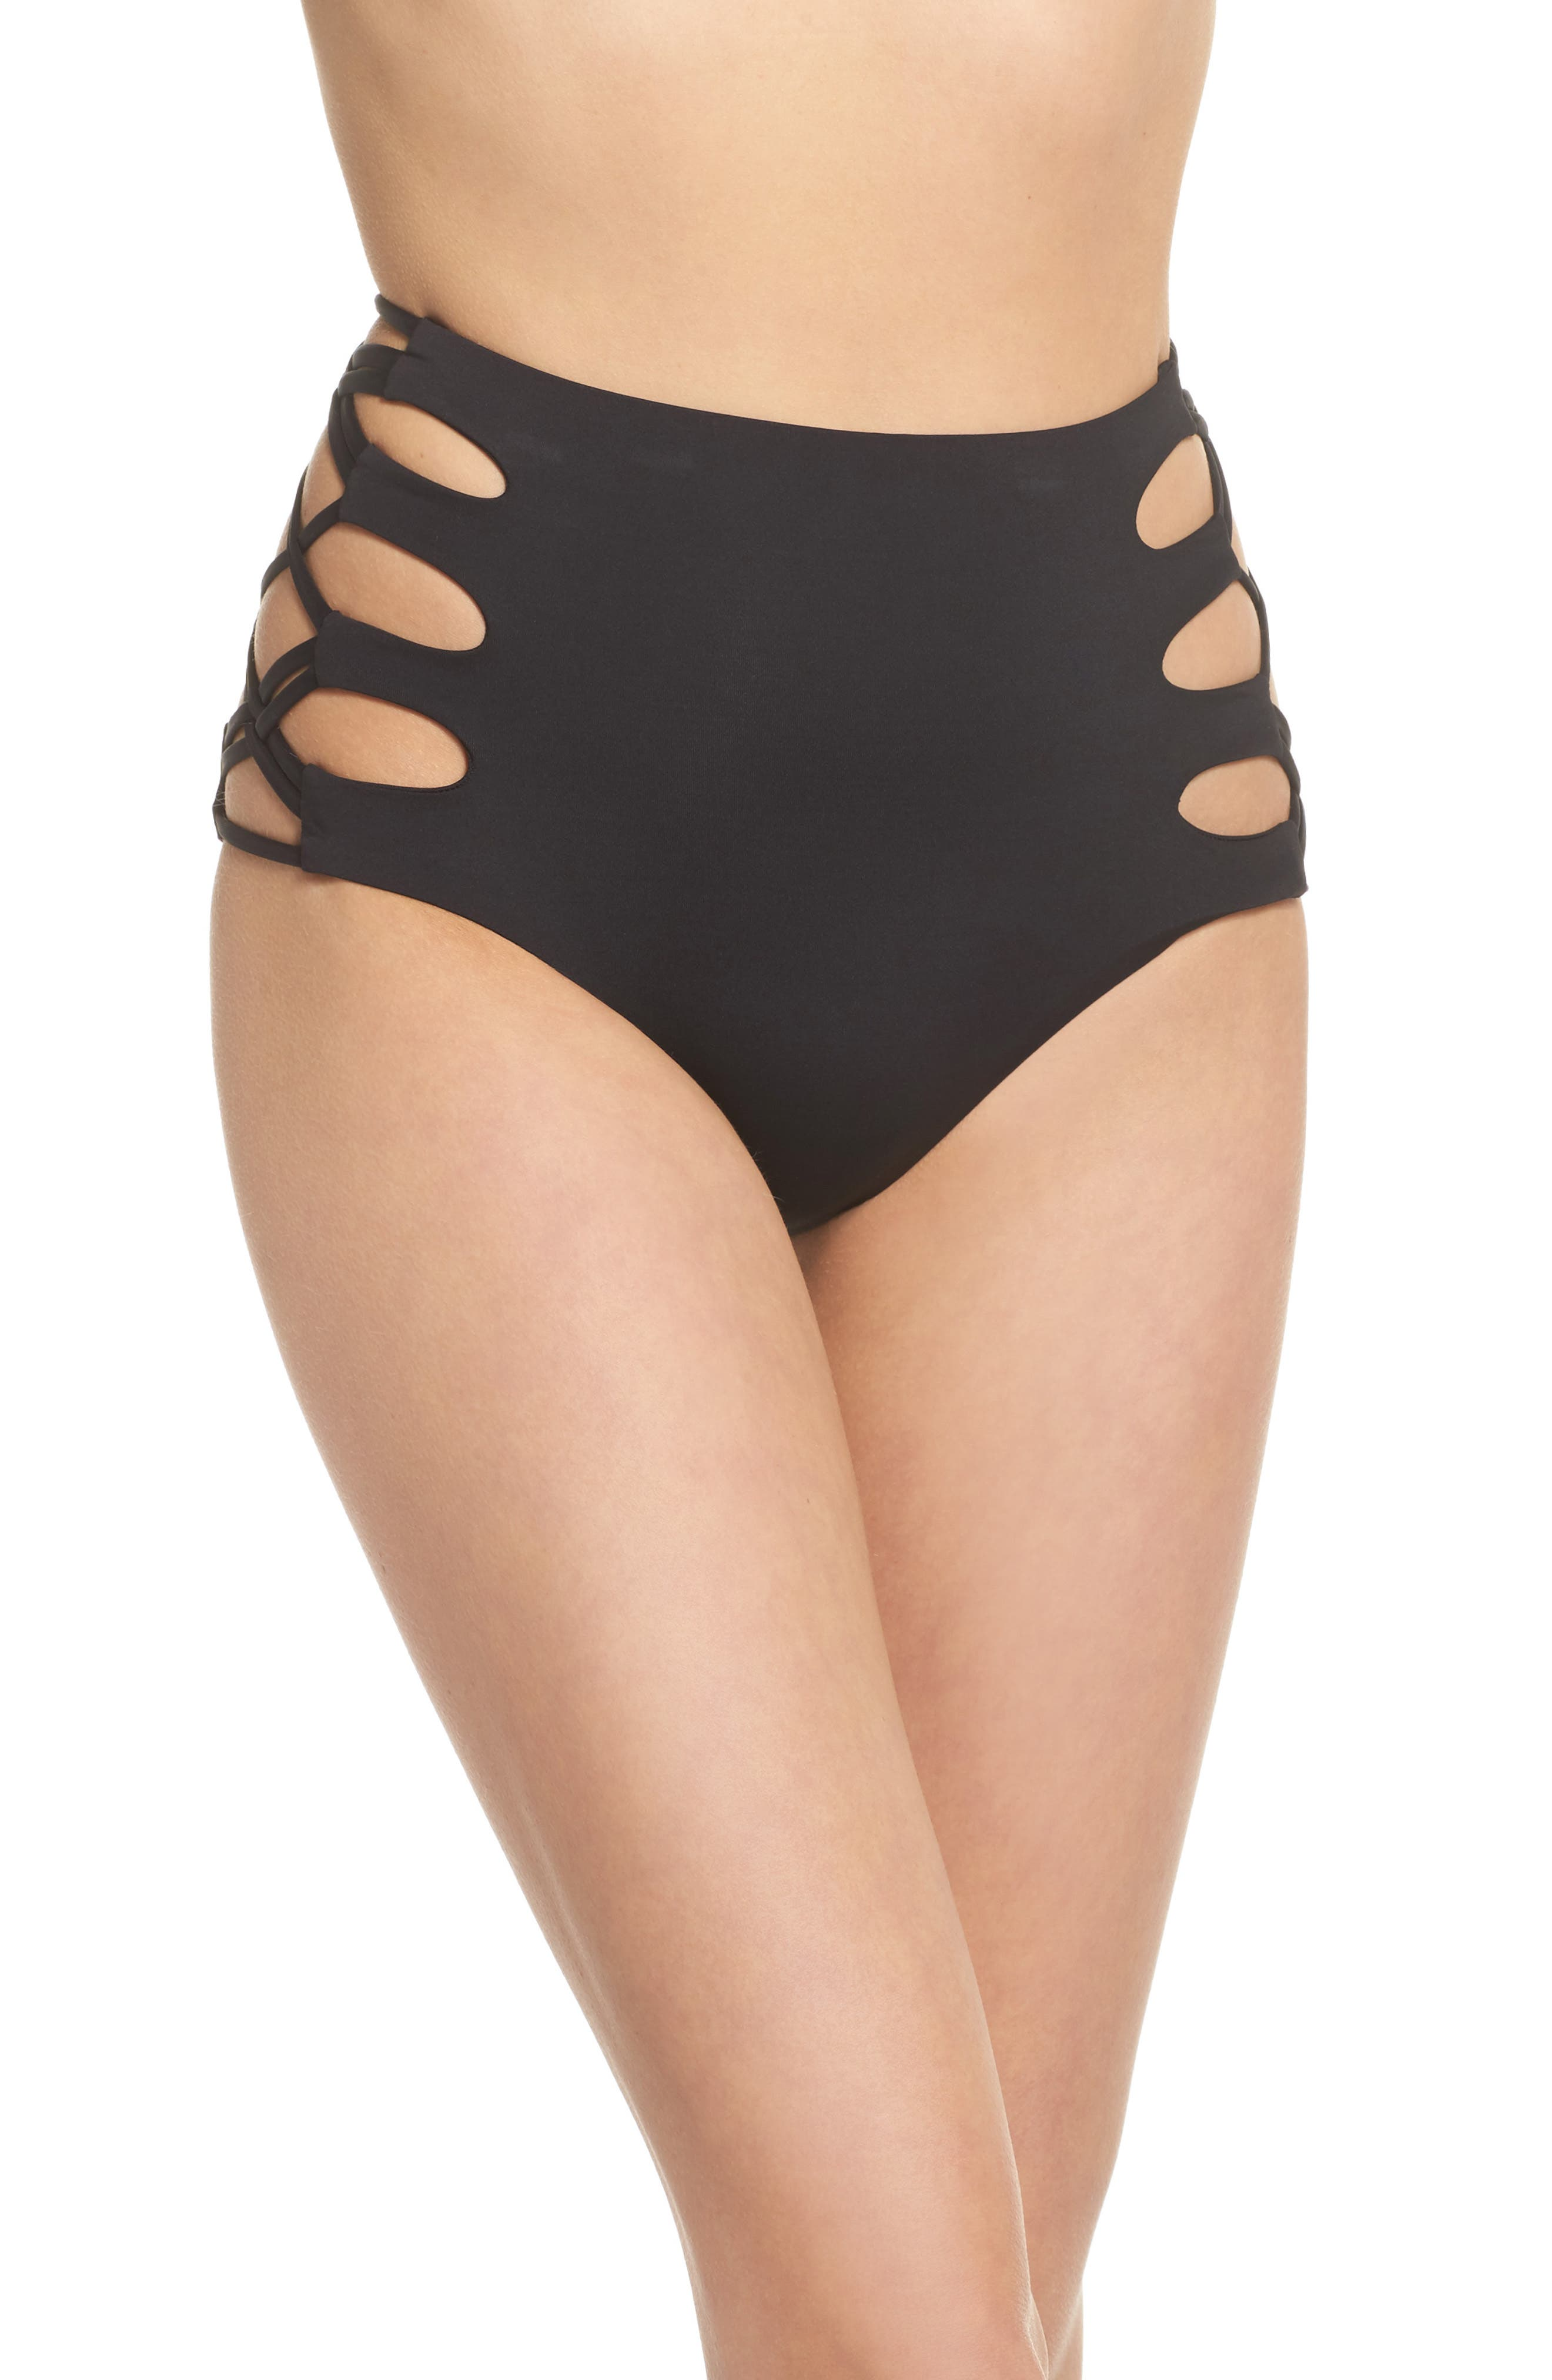 Isabella Rose Paradise High Waist Bikini Bottoms